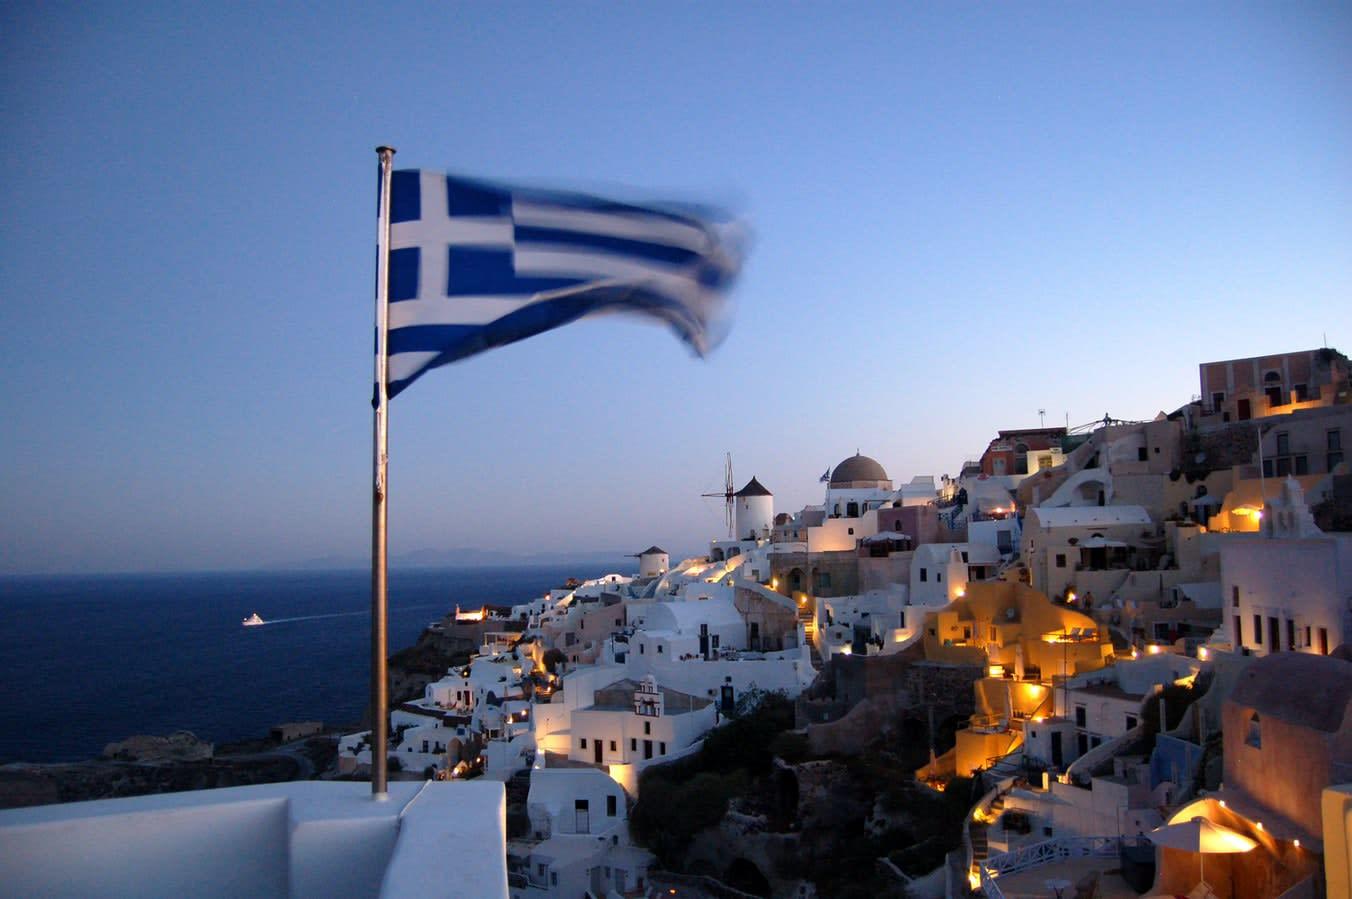 Play'n GO กลายเป็นภาษากรีกหลังจากได้รับใบอนุญาตประกอบการ